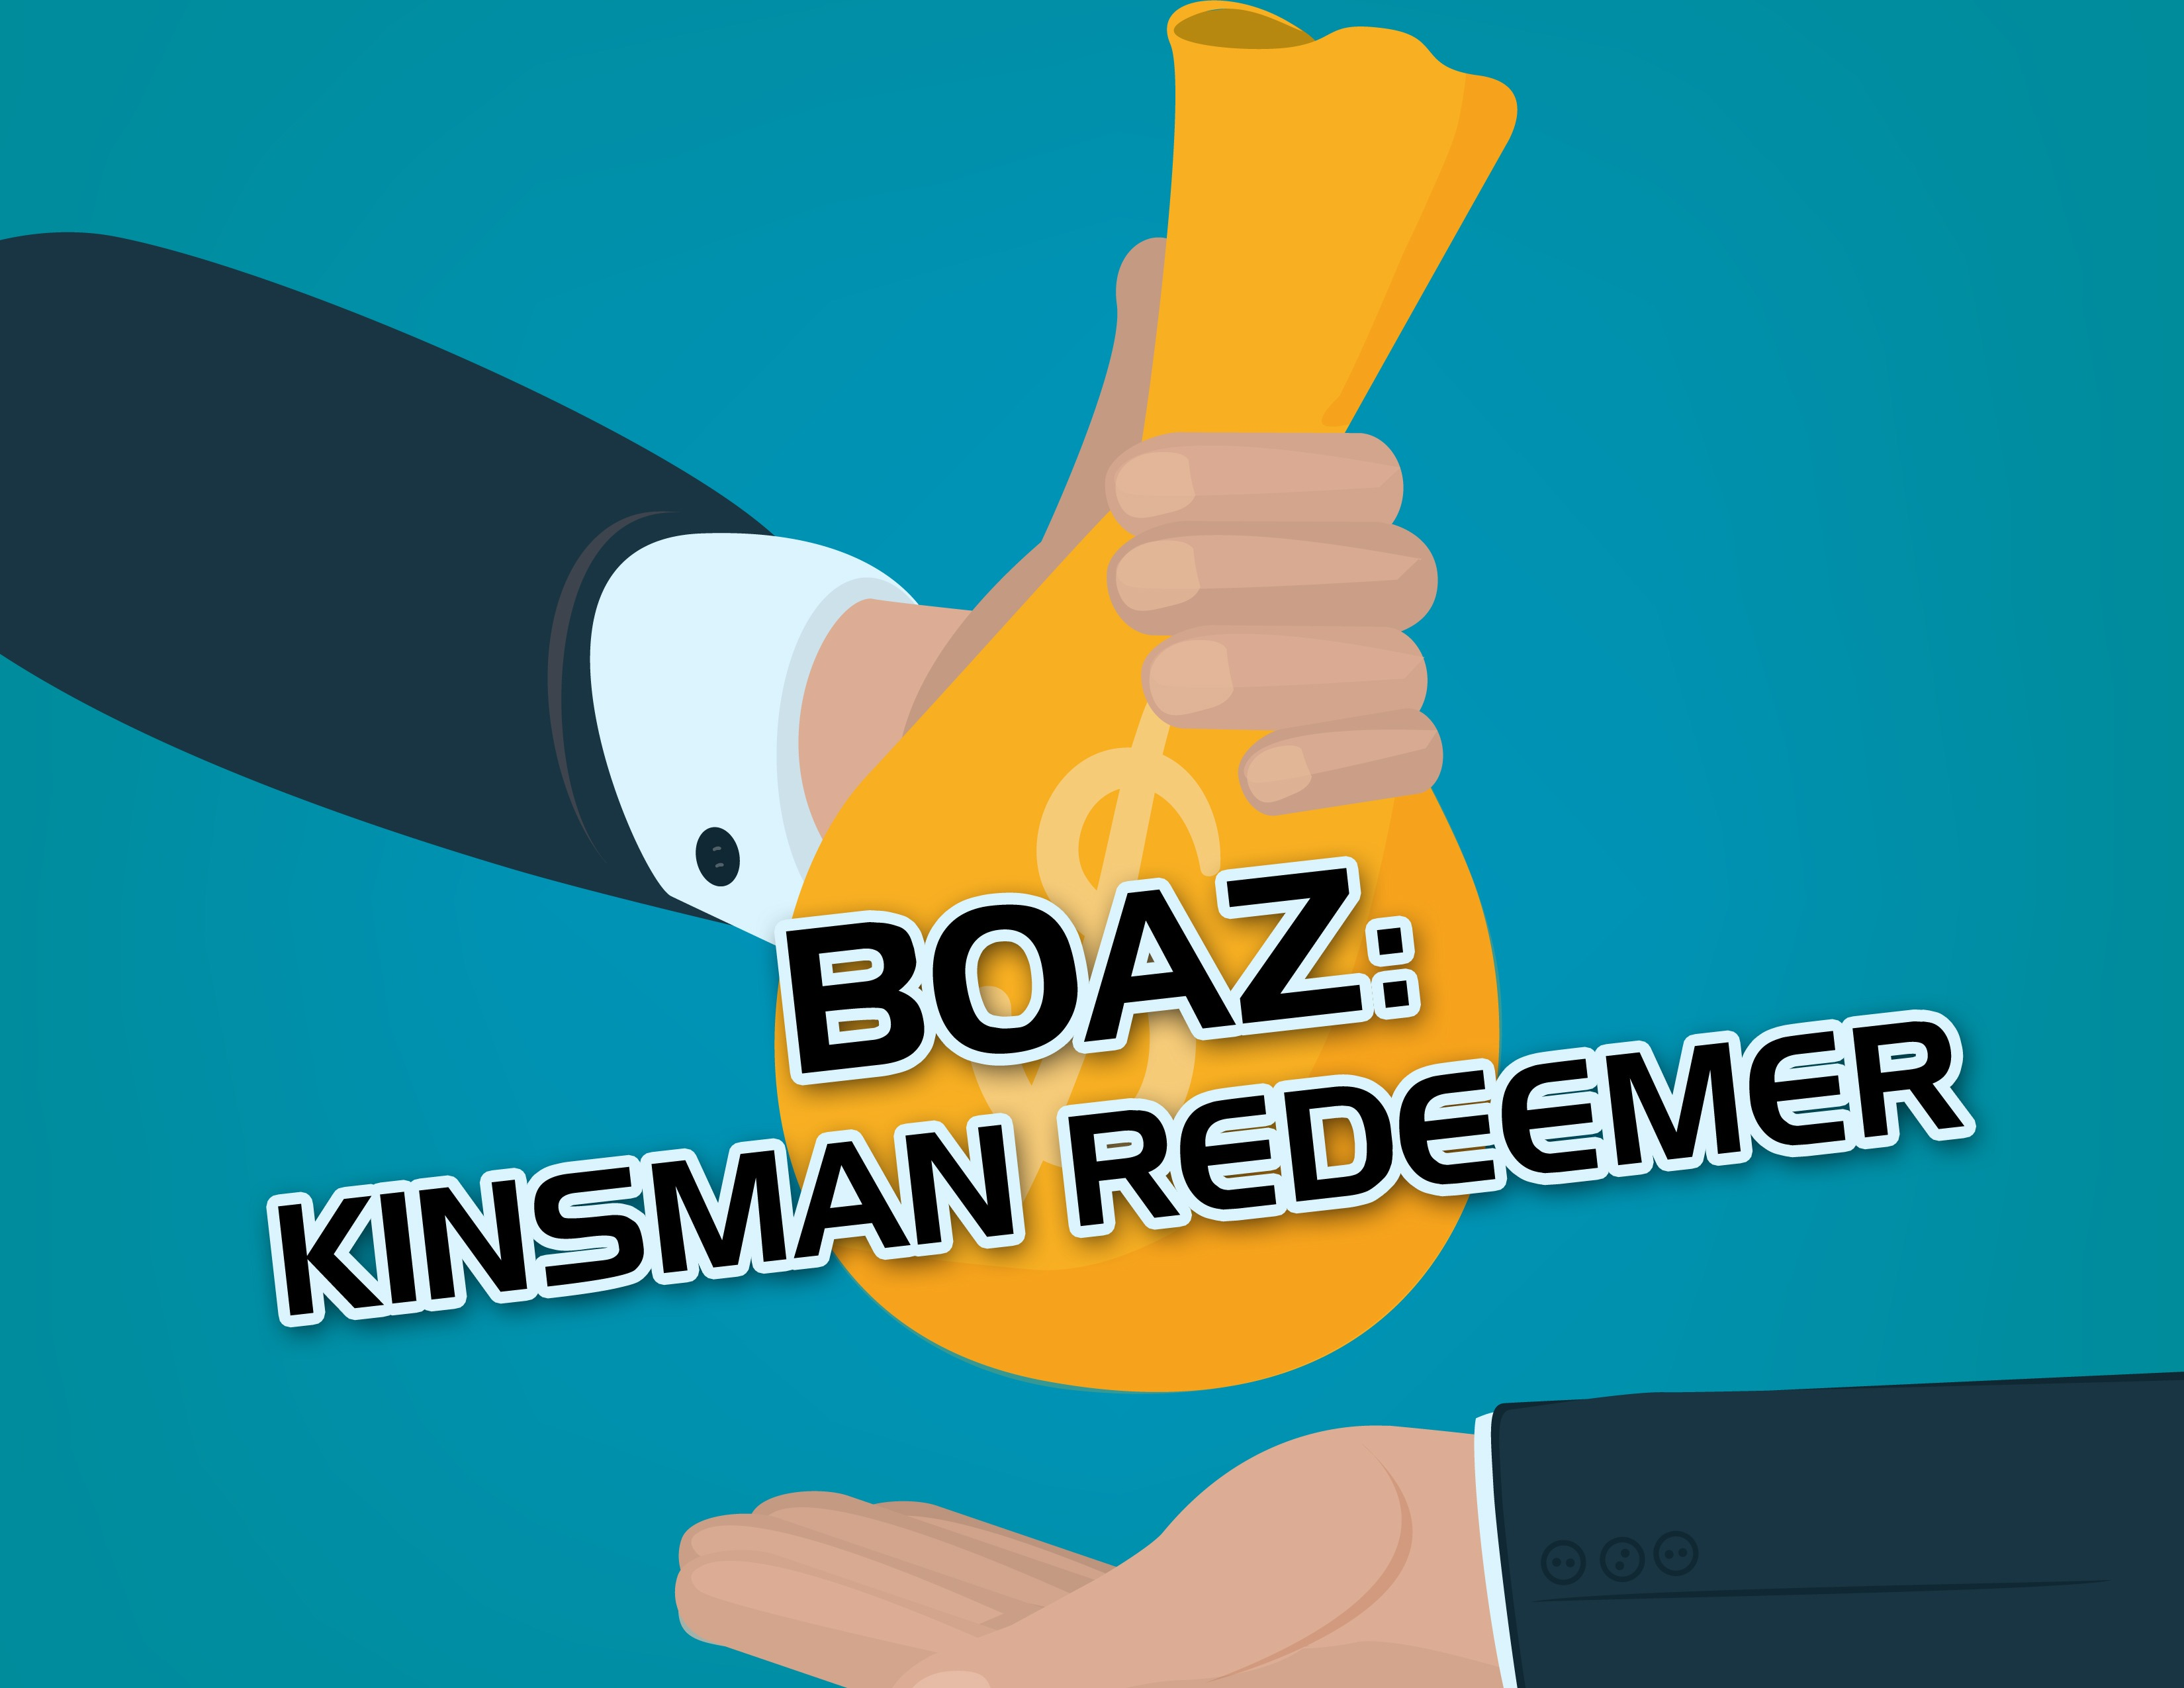 boaz aka kinsman redeemer u2022 ministryark